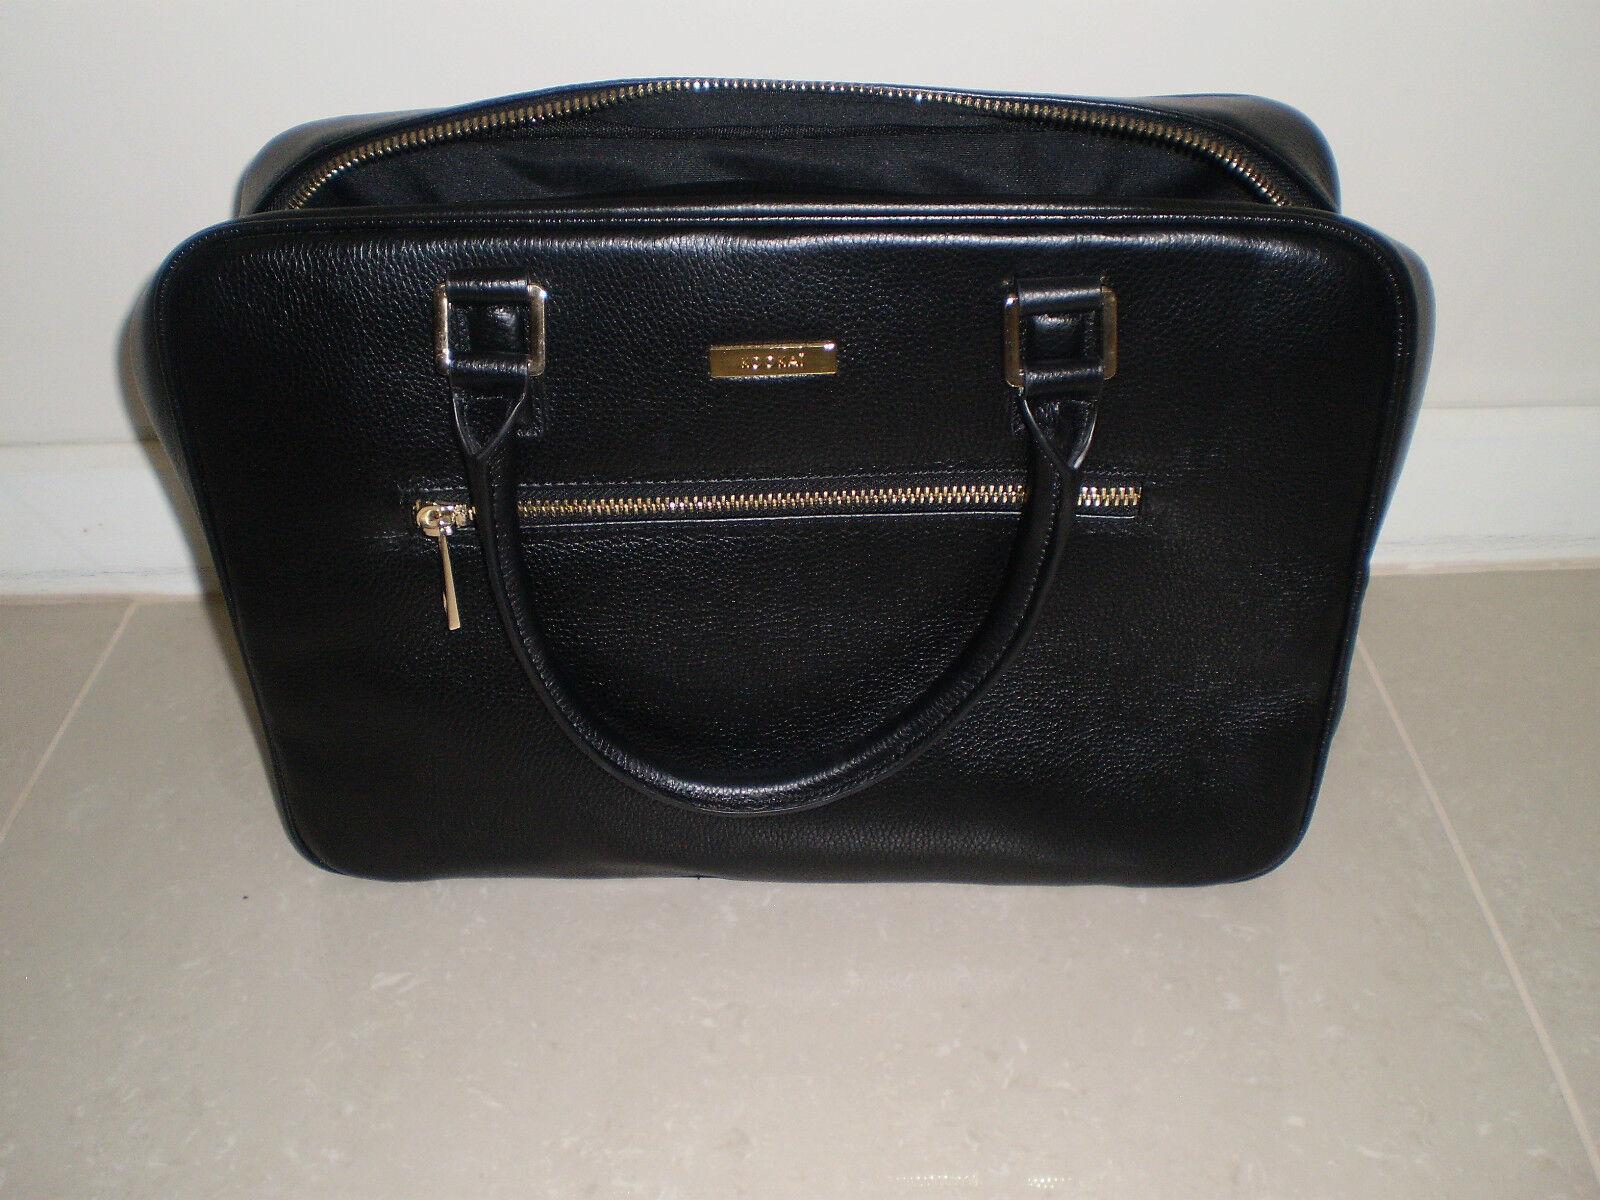 Kookai Leather Bag Black For